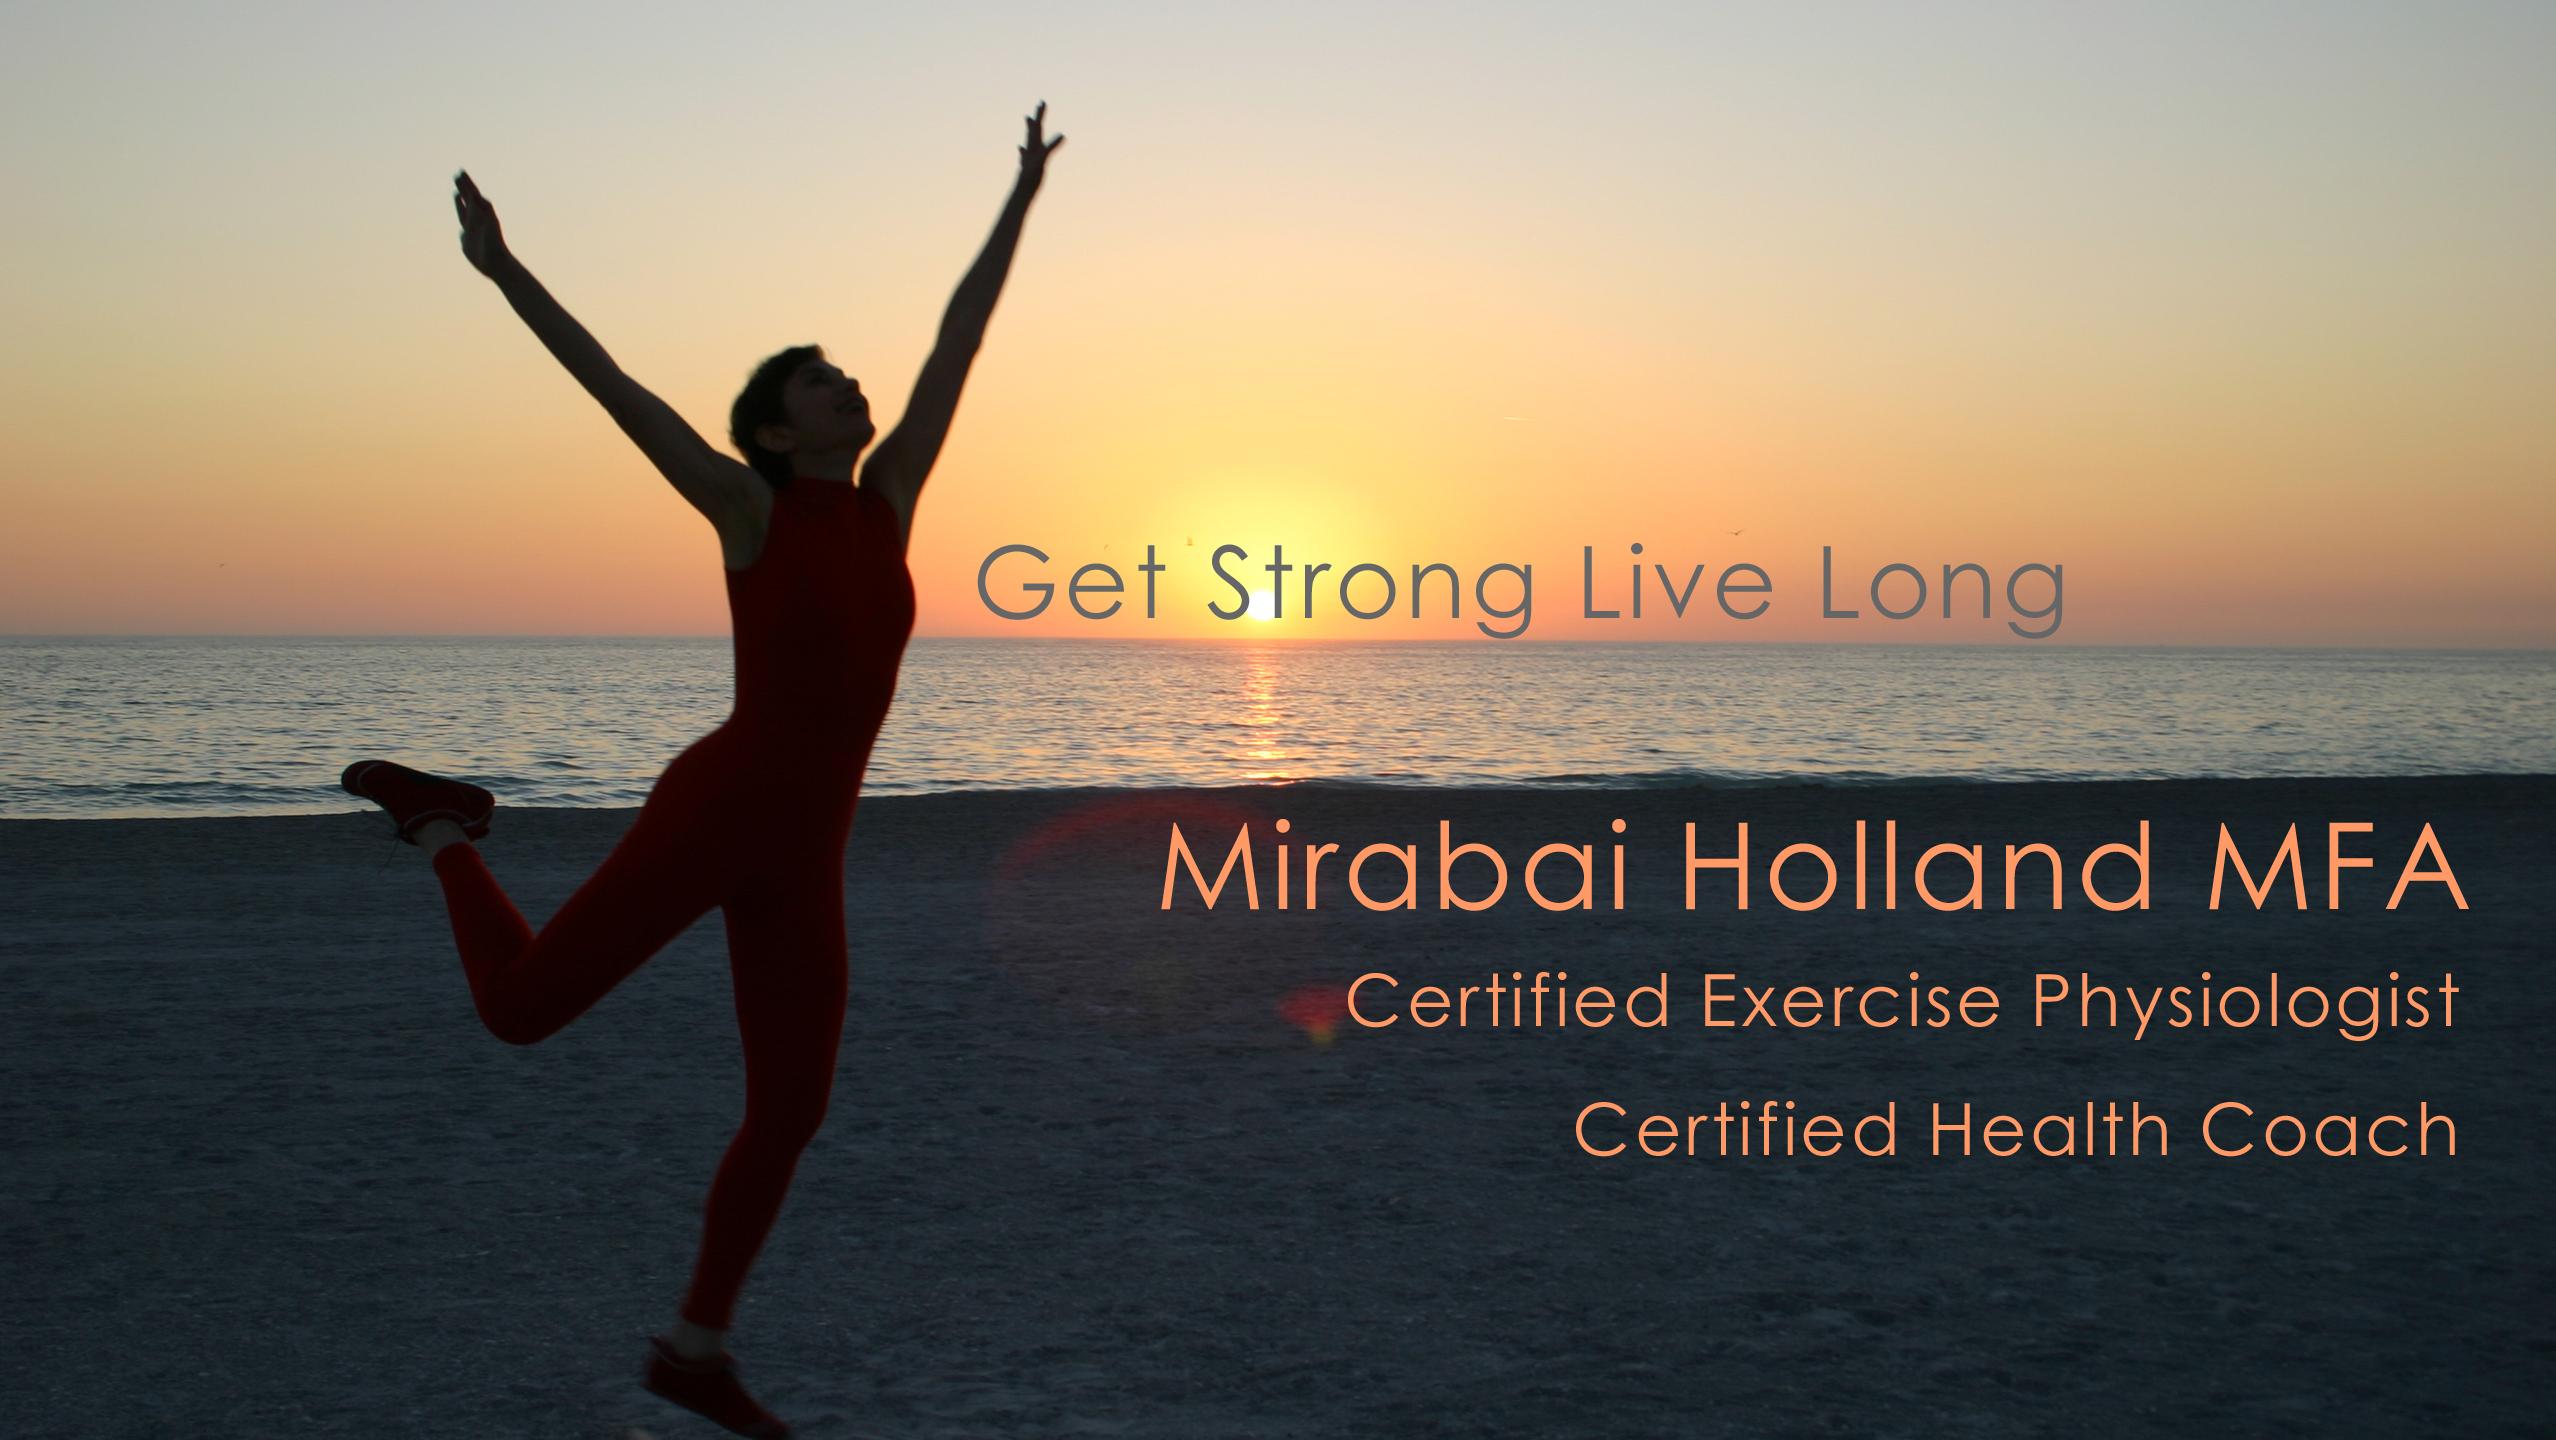 mirabai-holland-get-strong-banner-copy.jpg